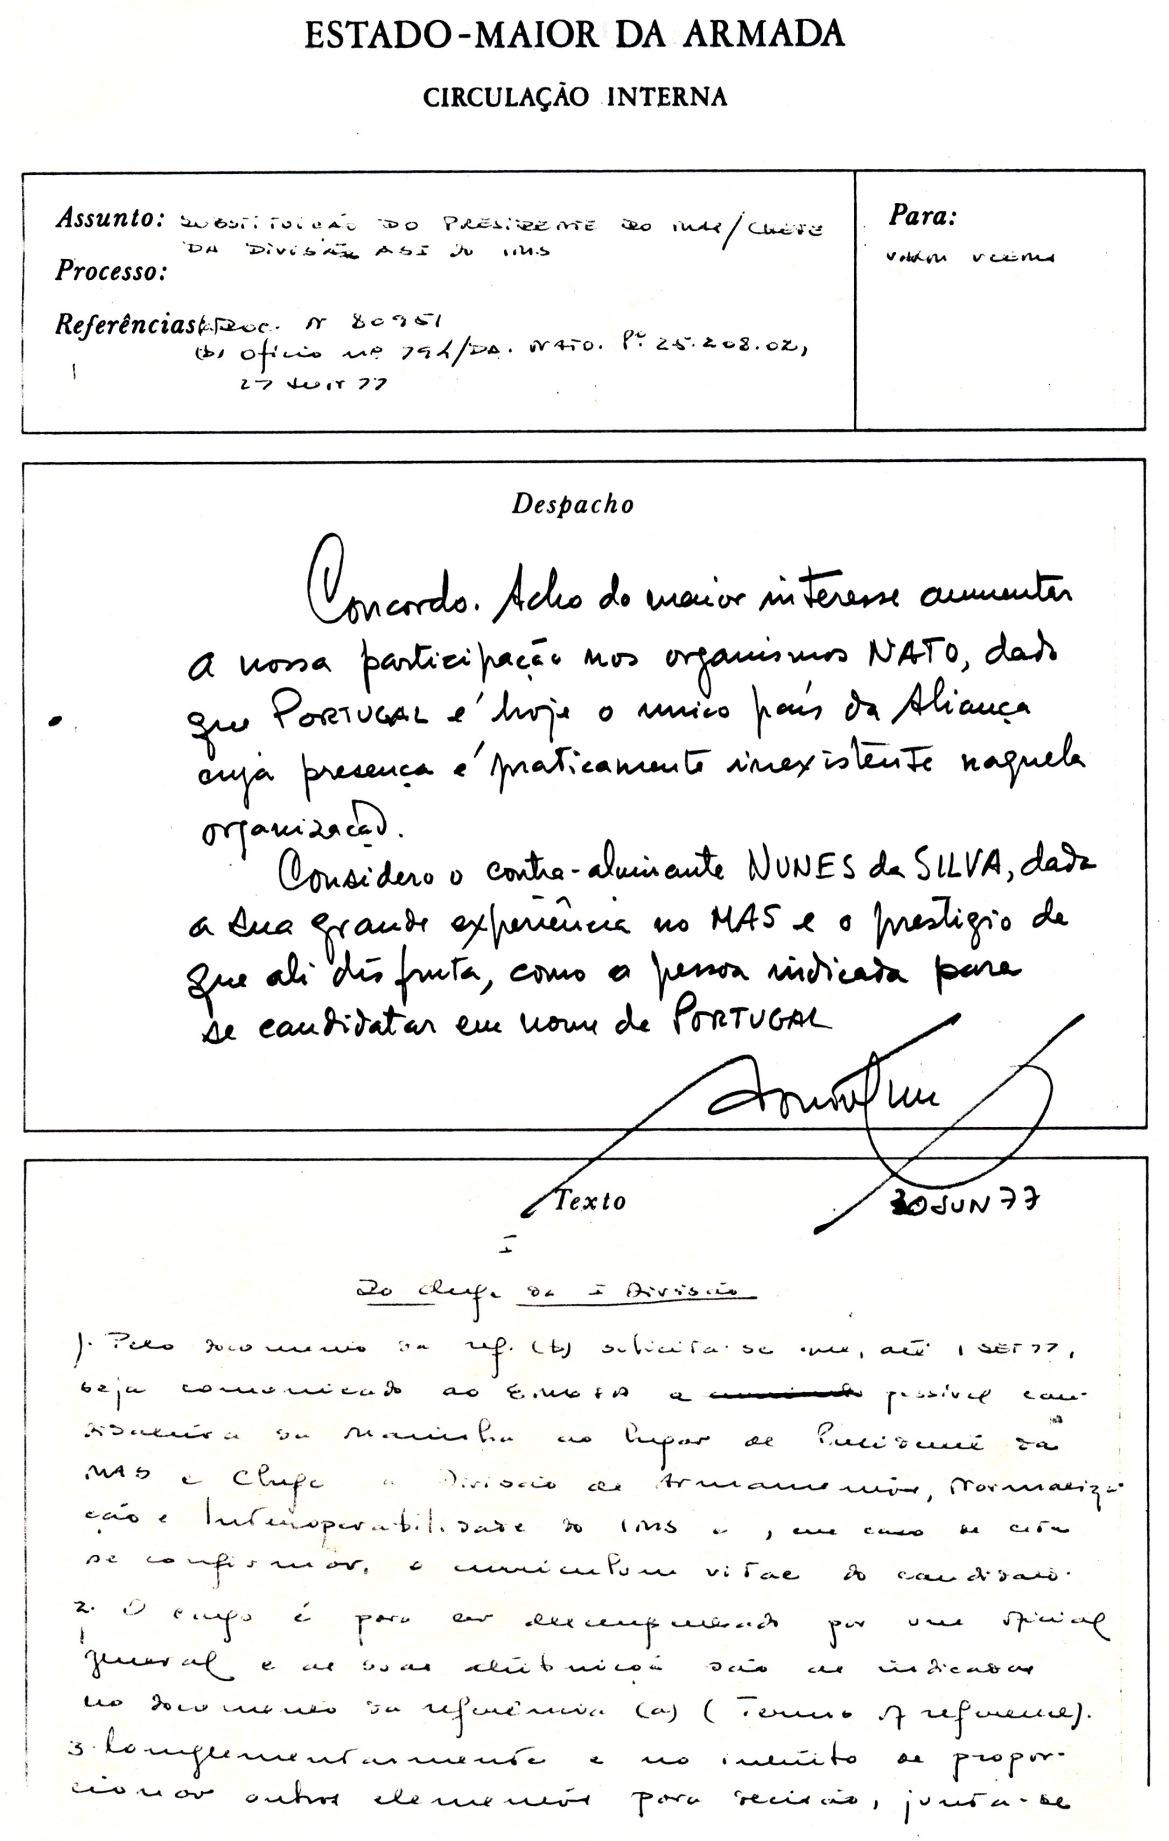 00823 977-06-30 Cargo na NATO - Alm CEMA concorda com a candidatura do Contra-Almirante Nunes da Silva